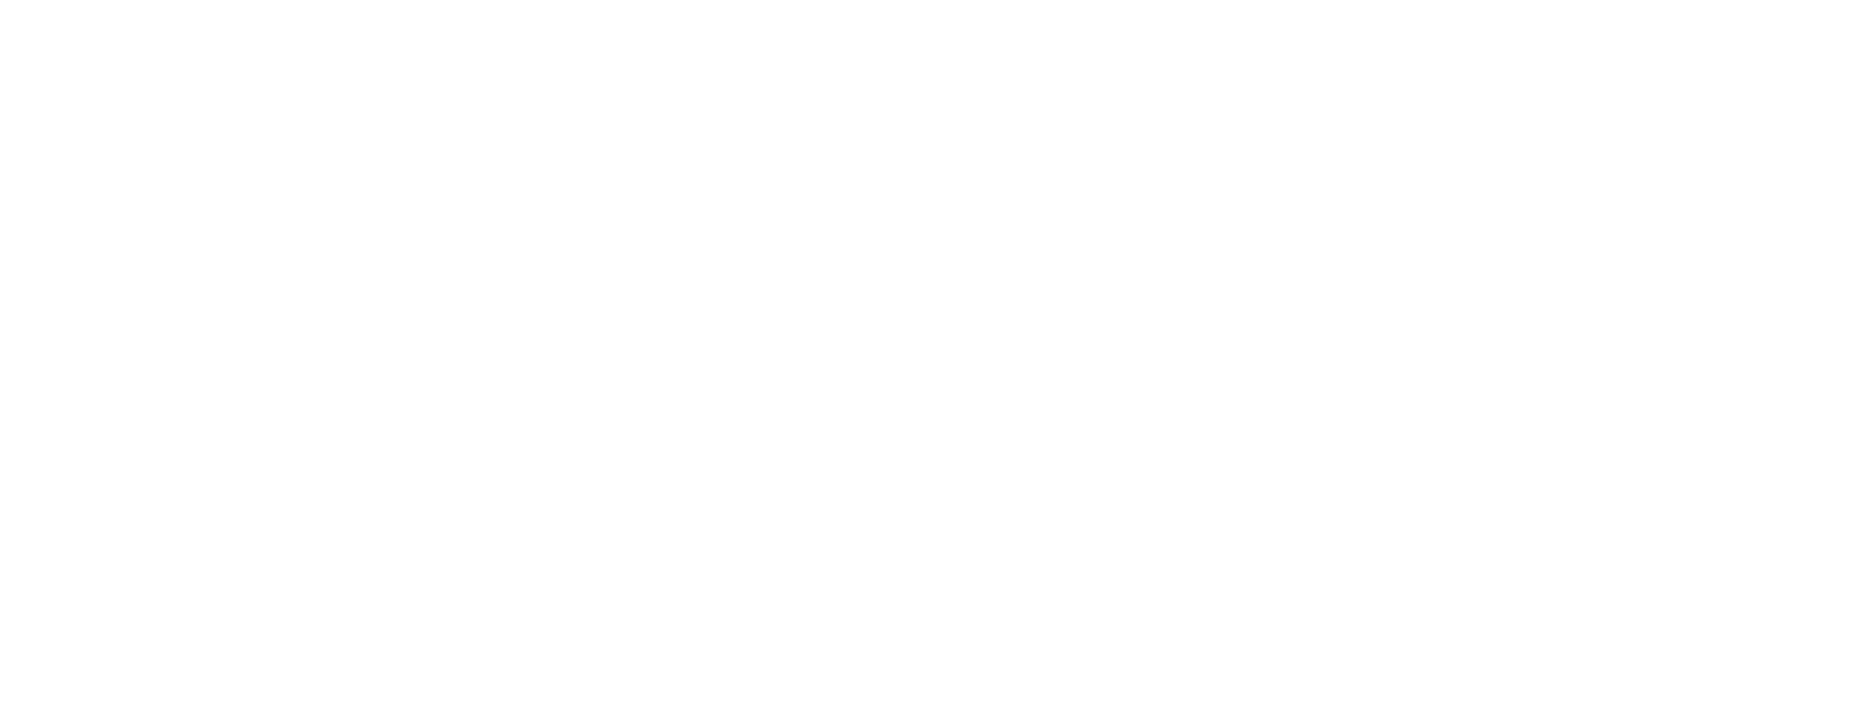 Zement Logo